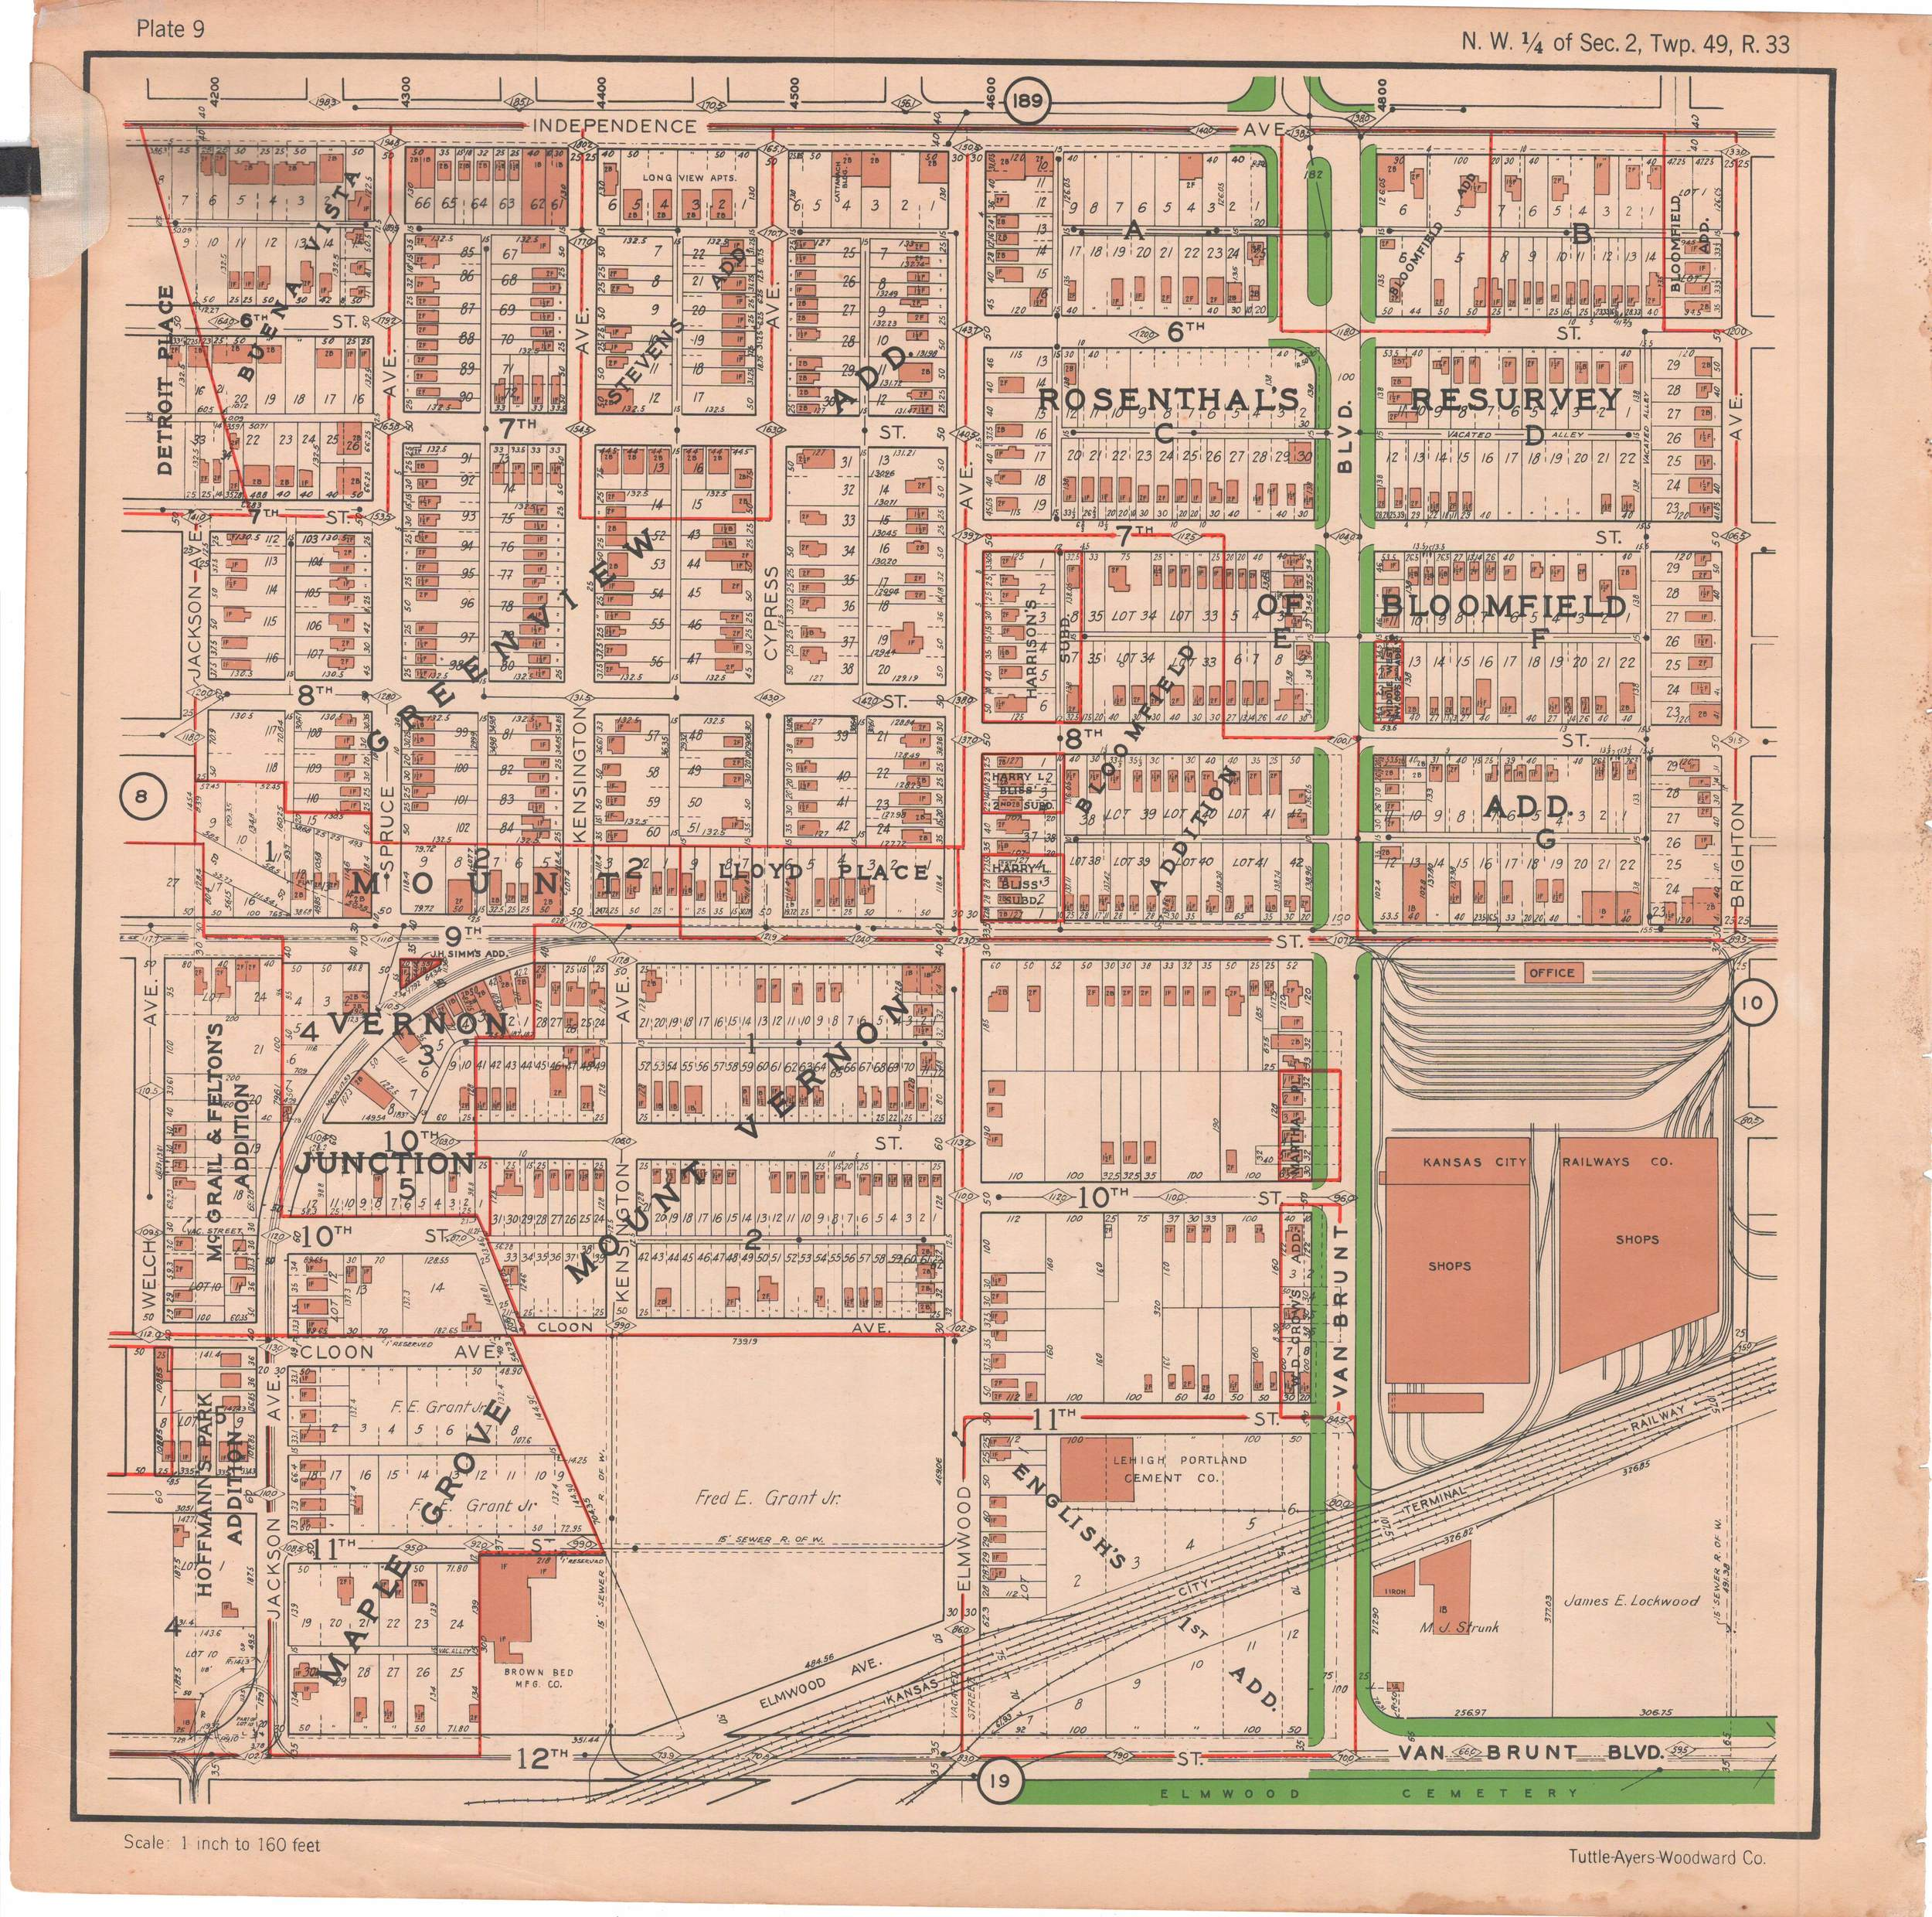 1925 TUTTLE_AYERS_Plate 9.JPG